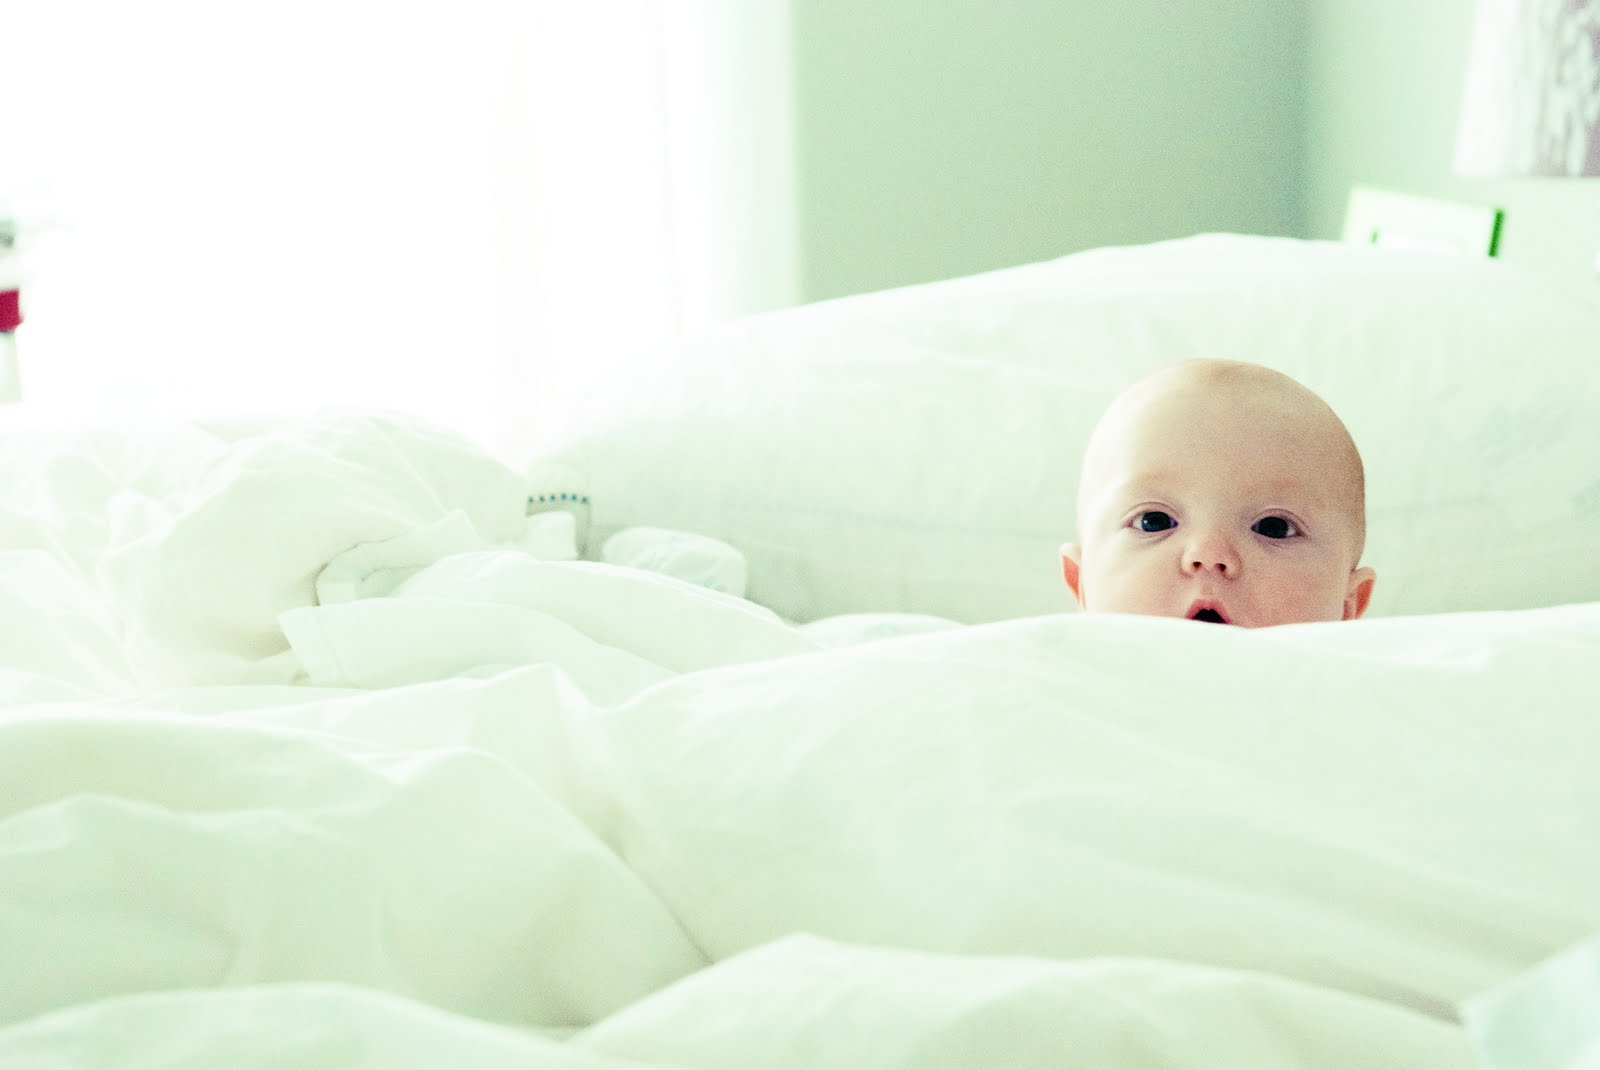 Good Morning Love Boy : Good morning baby boy pic many hd wallpaper